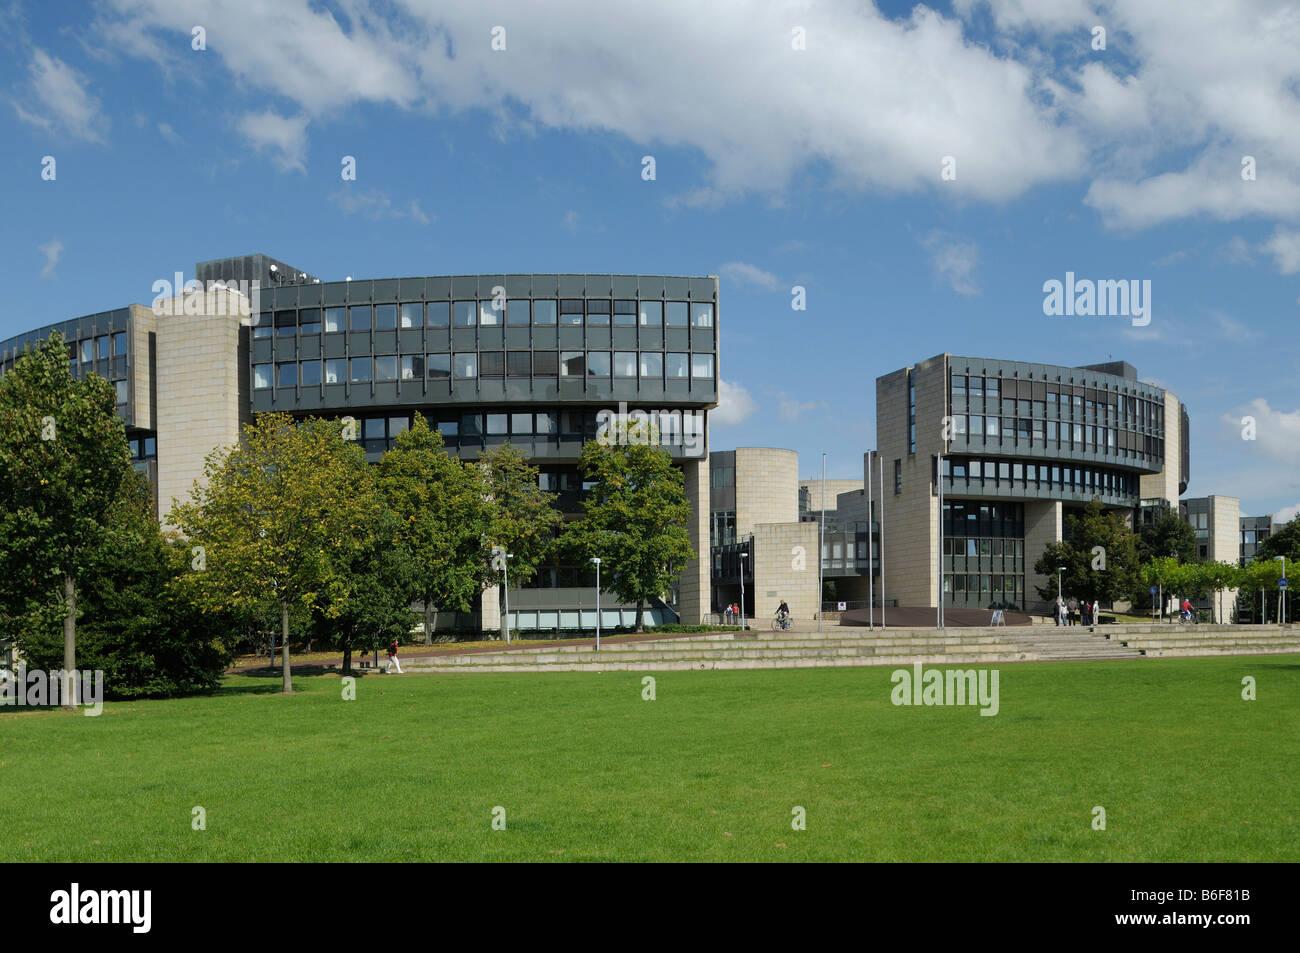 North Rhine-Westphalian Parliament, view onto the entrance area, Duesseldorf, North Rhine-Westphalia, Germany, Europe - Stock Image